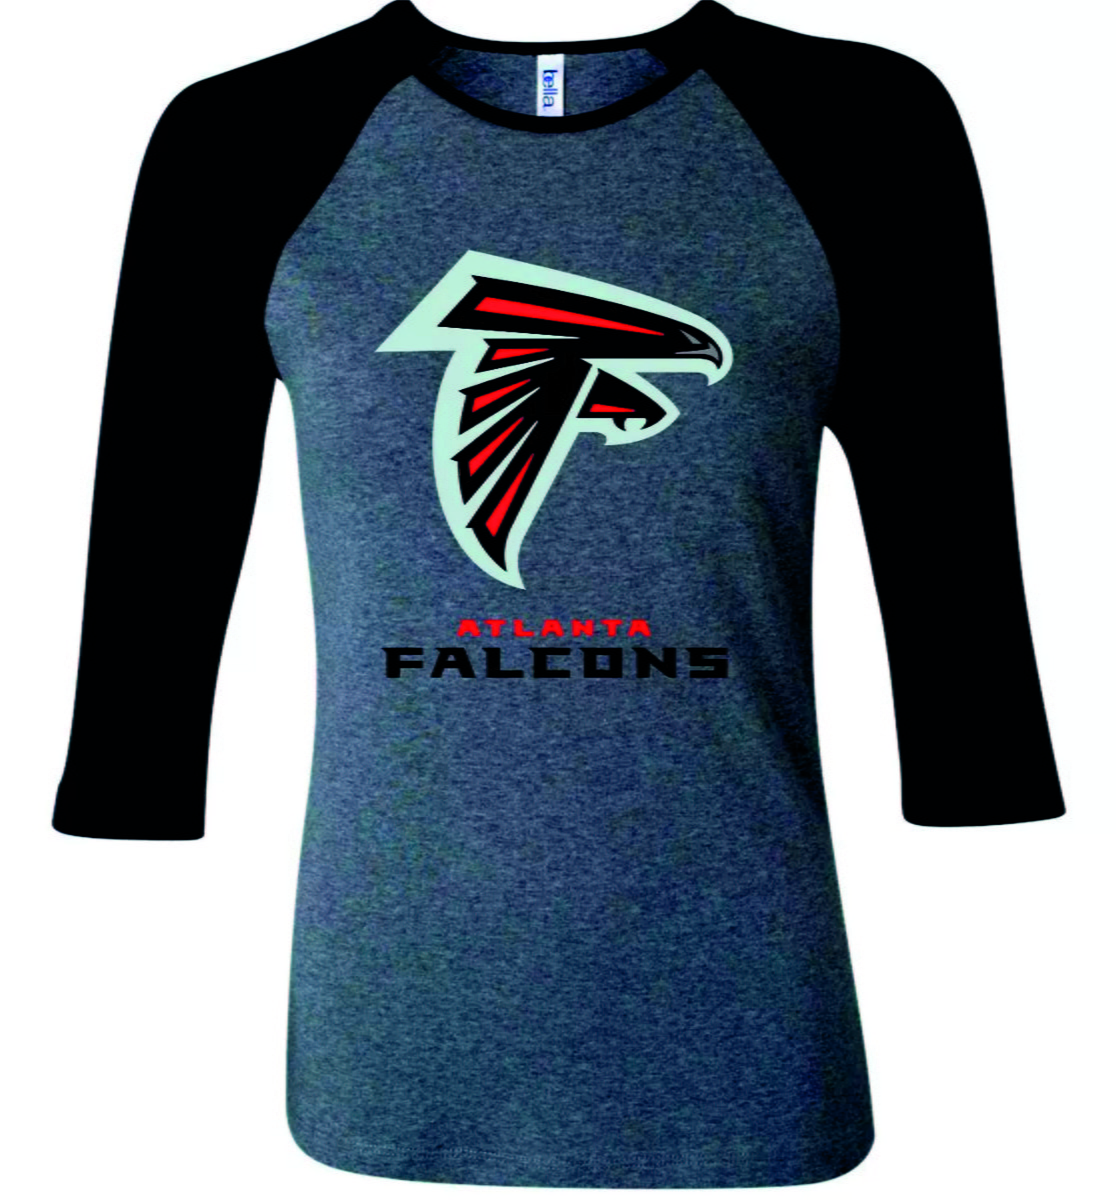 7c515ae230 Camiseta Raglan 3 4 Atlanta Falcons NFL no Elo7